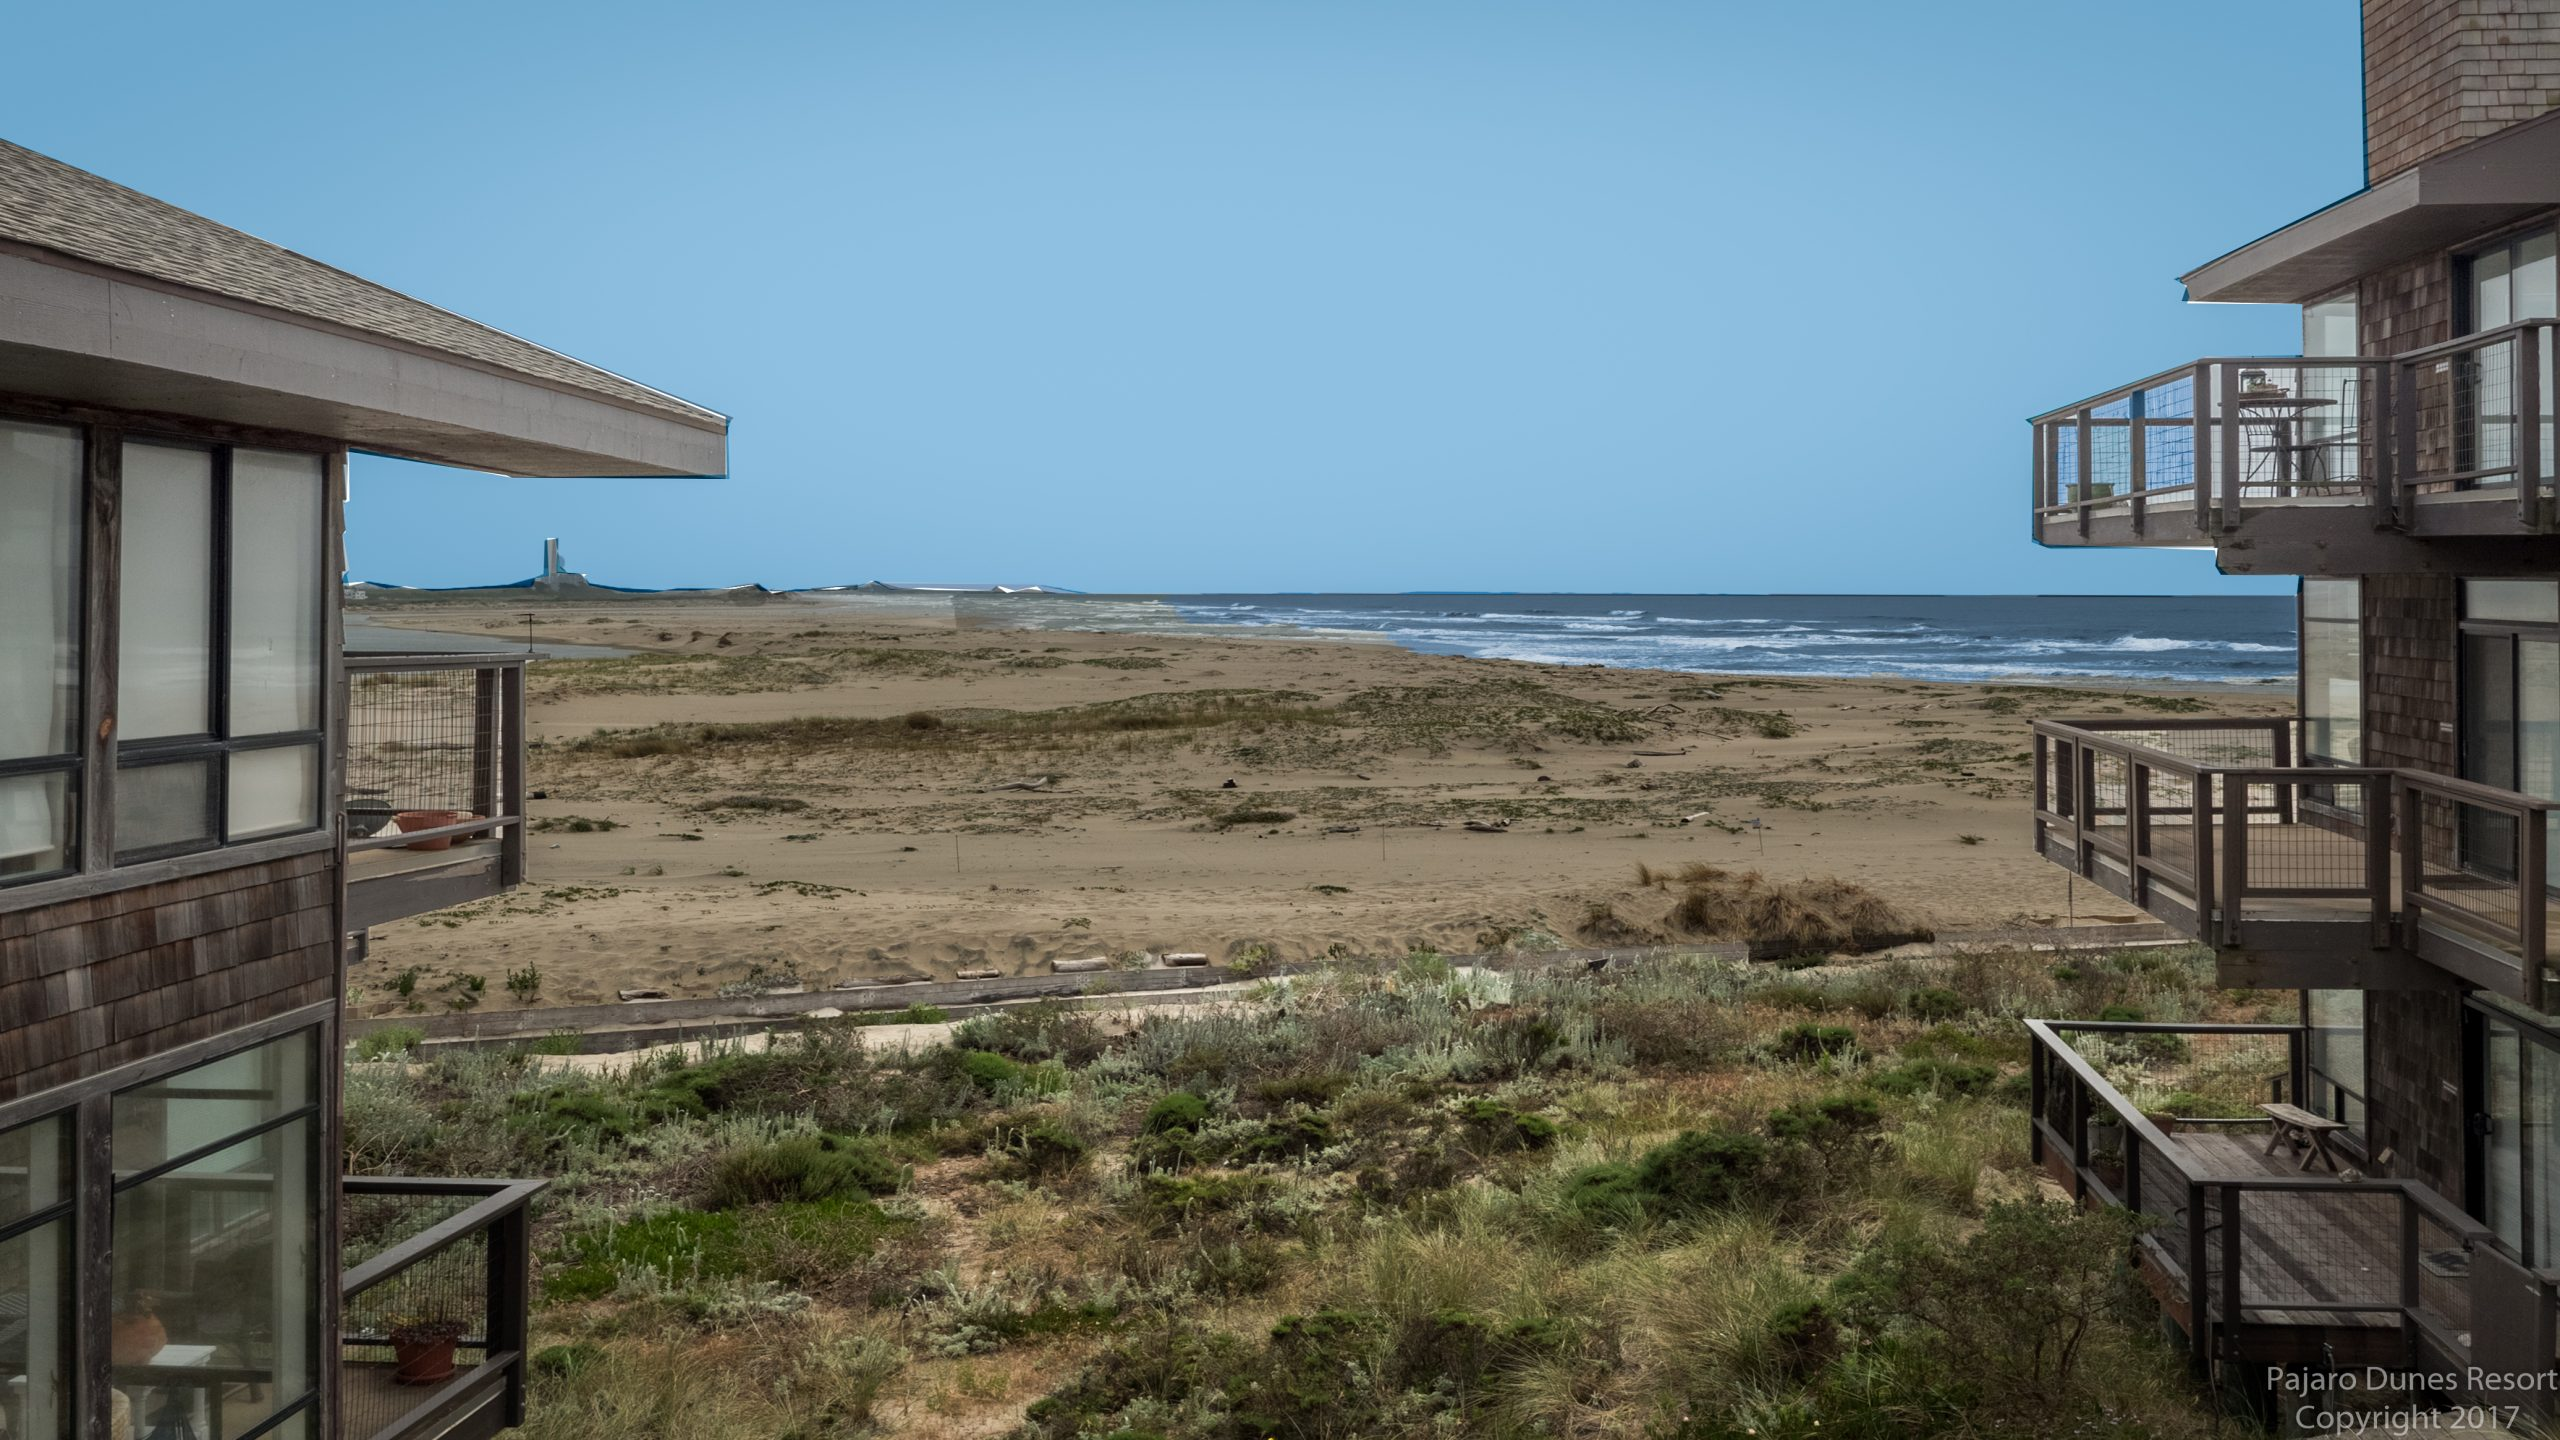 Pajaro Dunes Pelican 66 Image 3